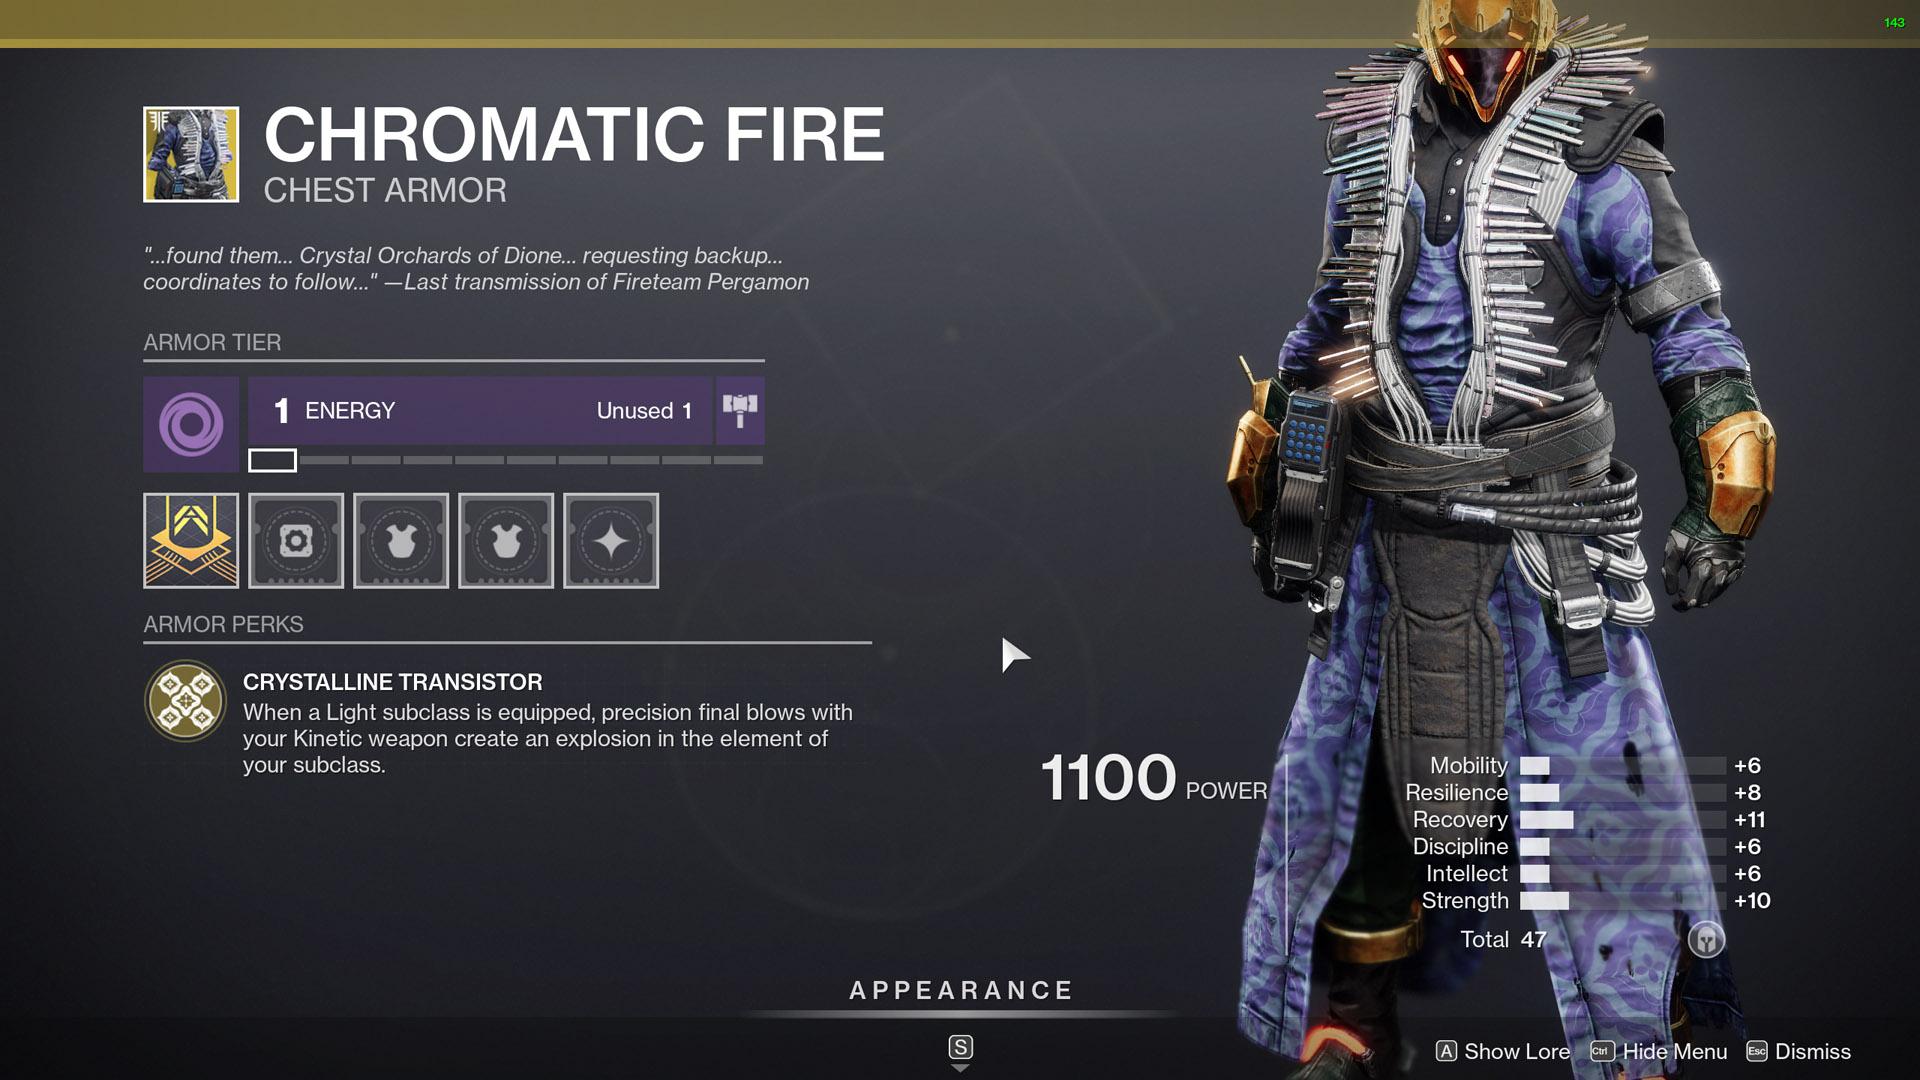 destiny 2 exotic warlock armor chromatic fire